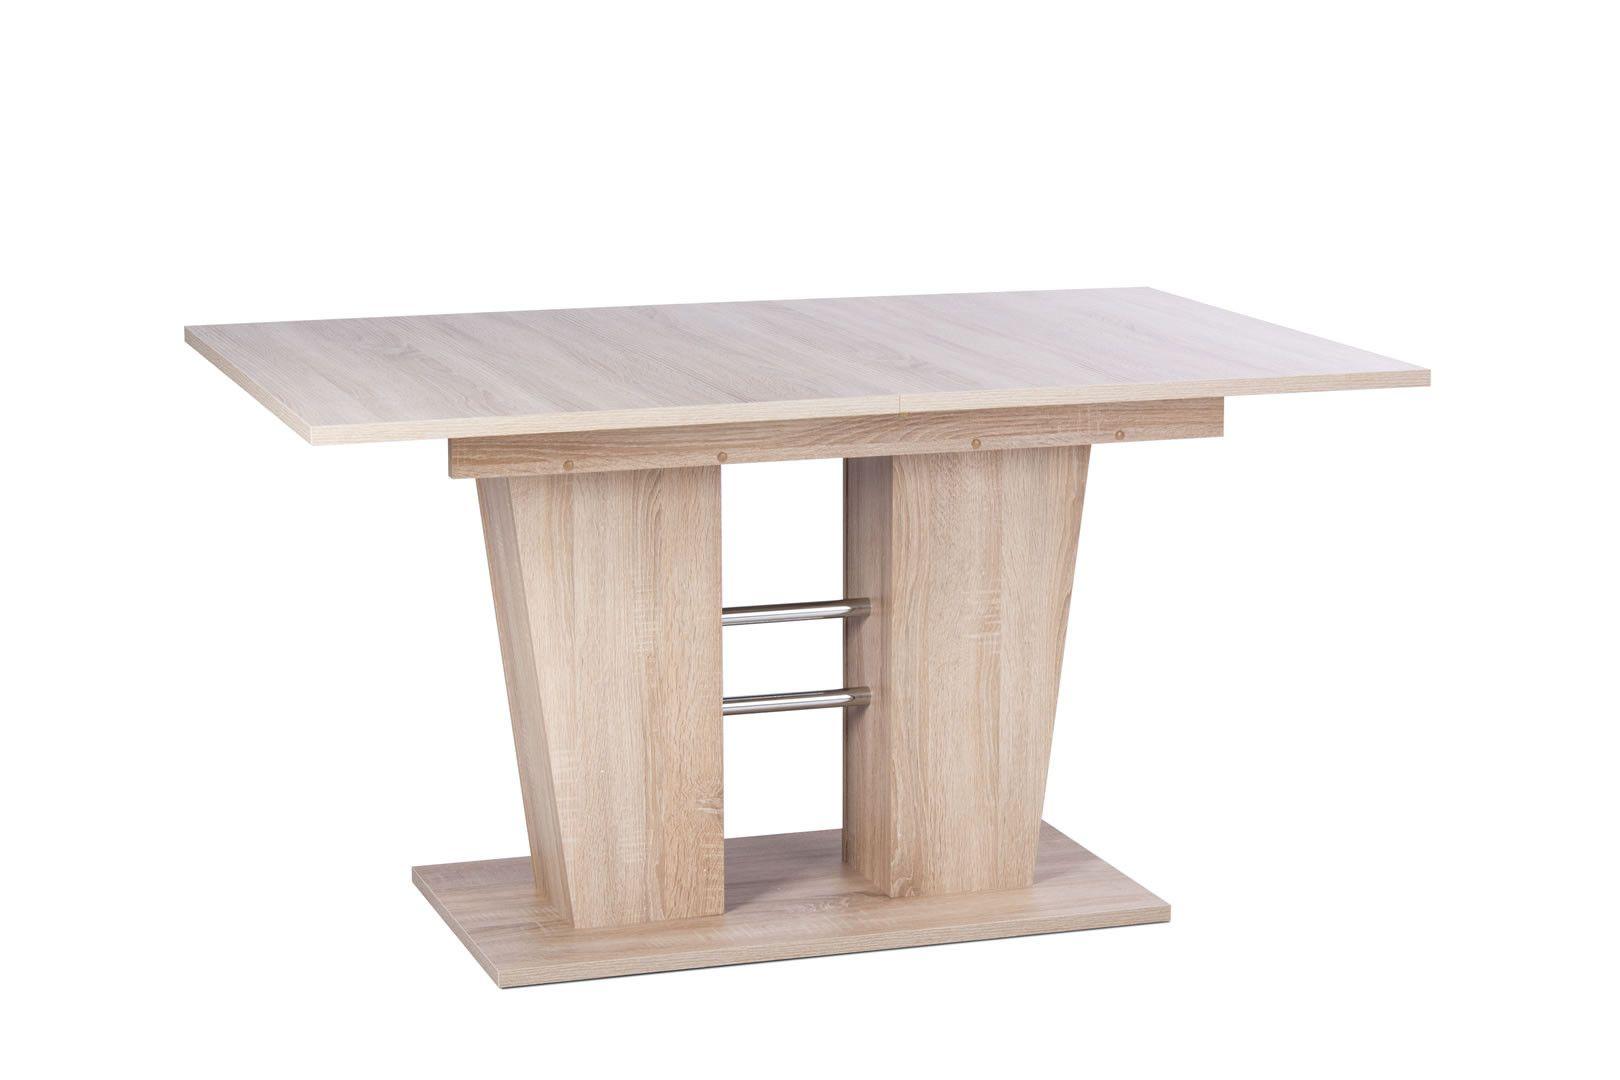 Tables rallonge table de salle manger avec allonge - Table de salle a manger avec rallonge ...